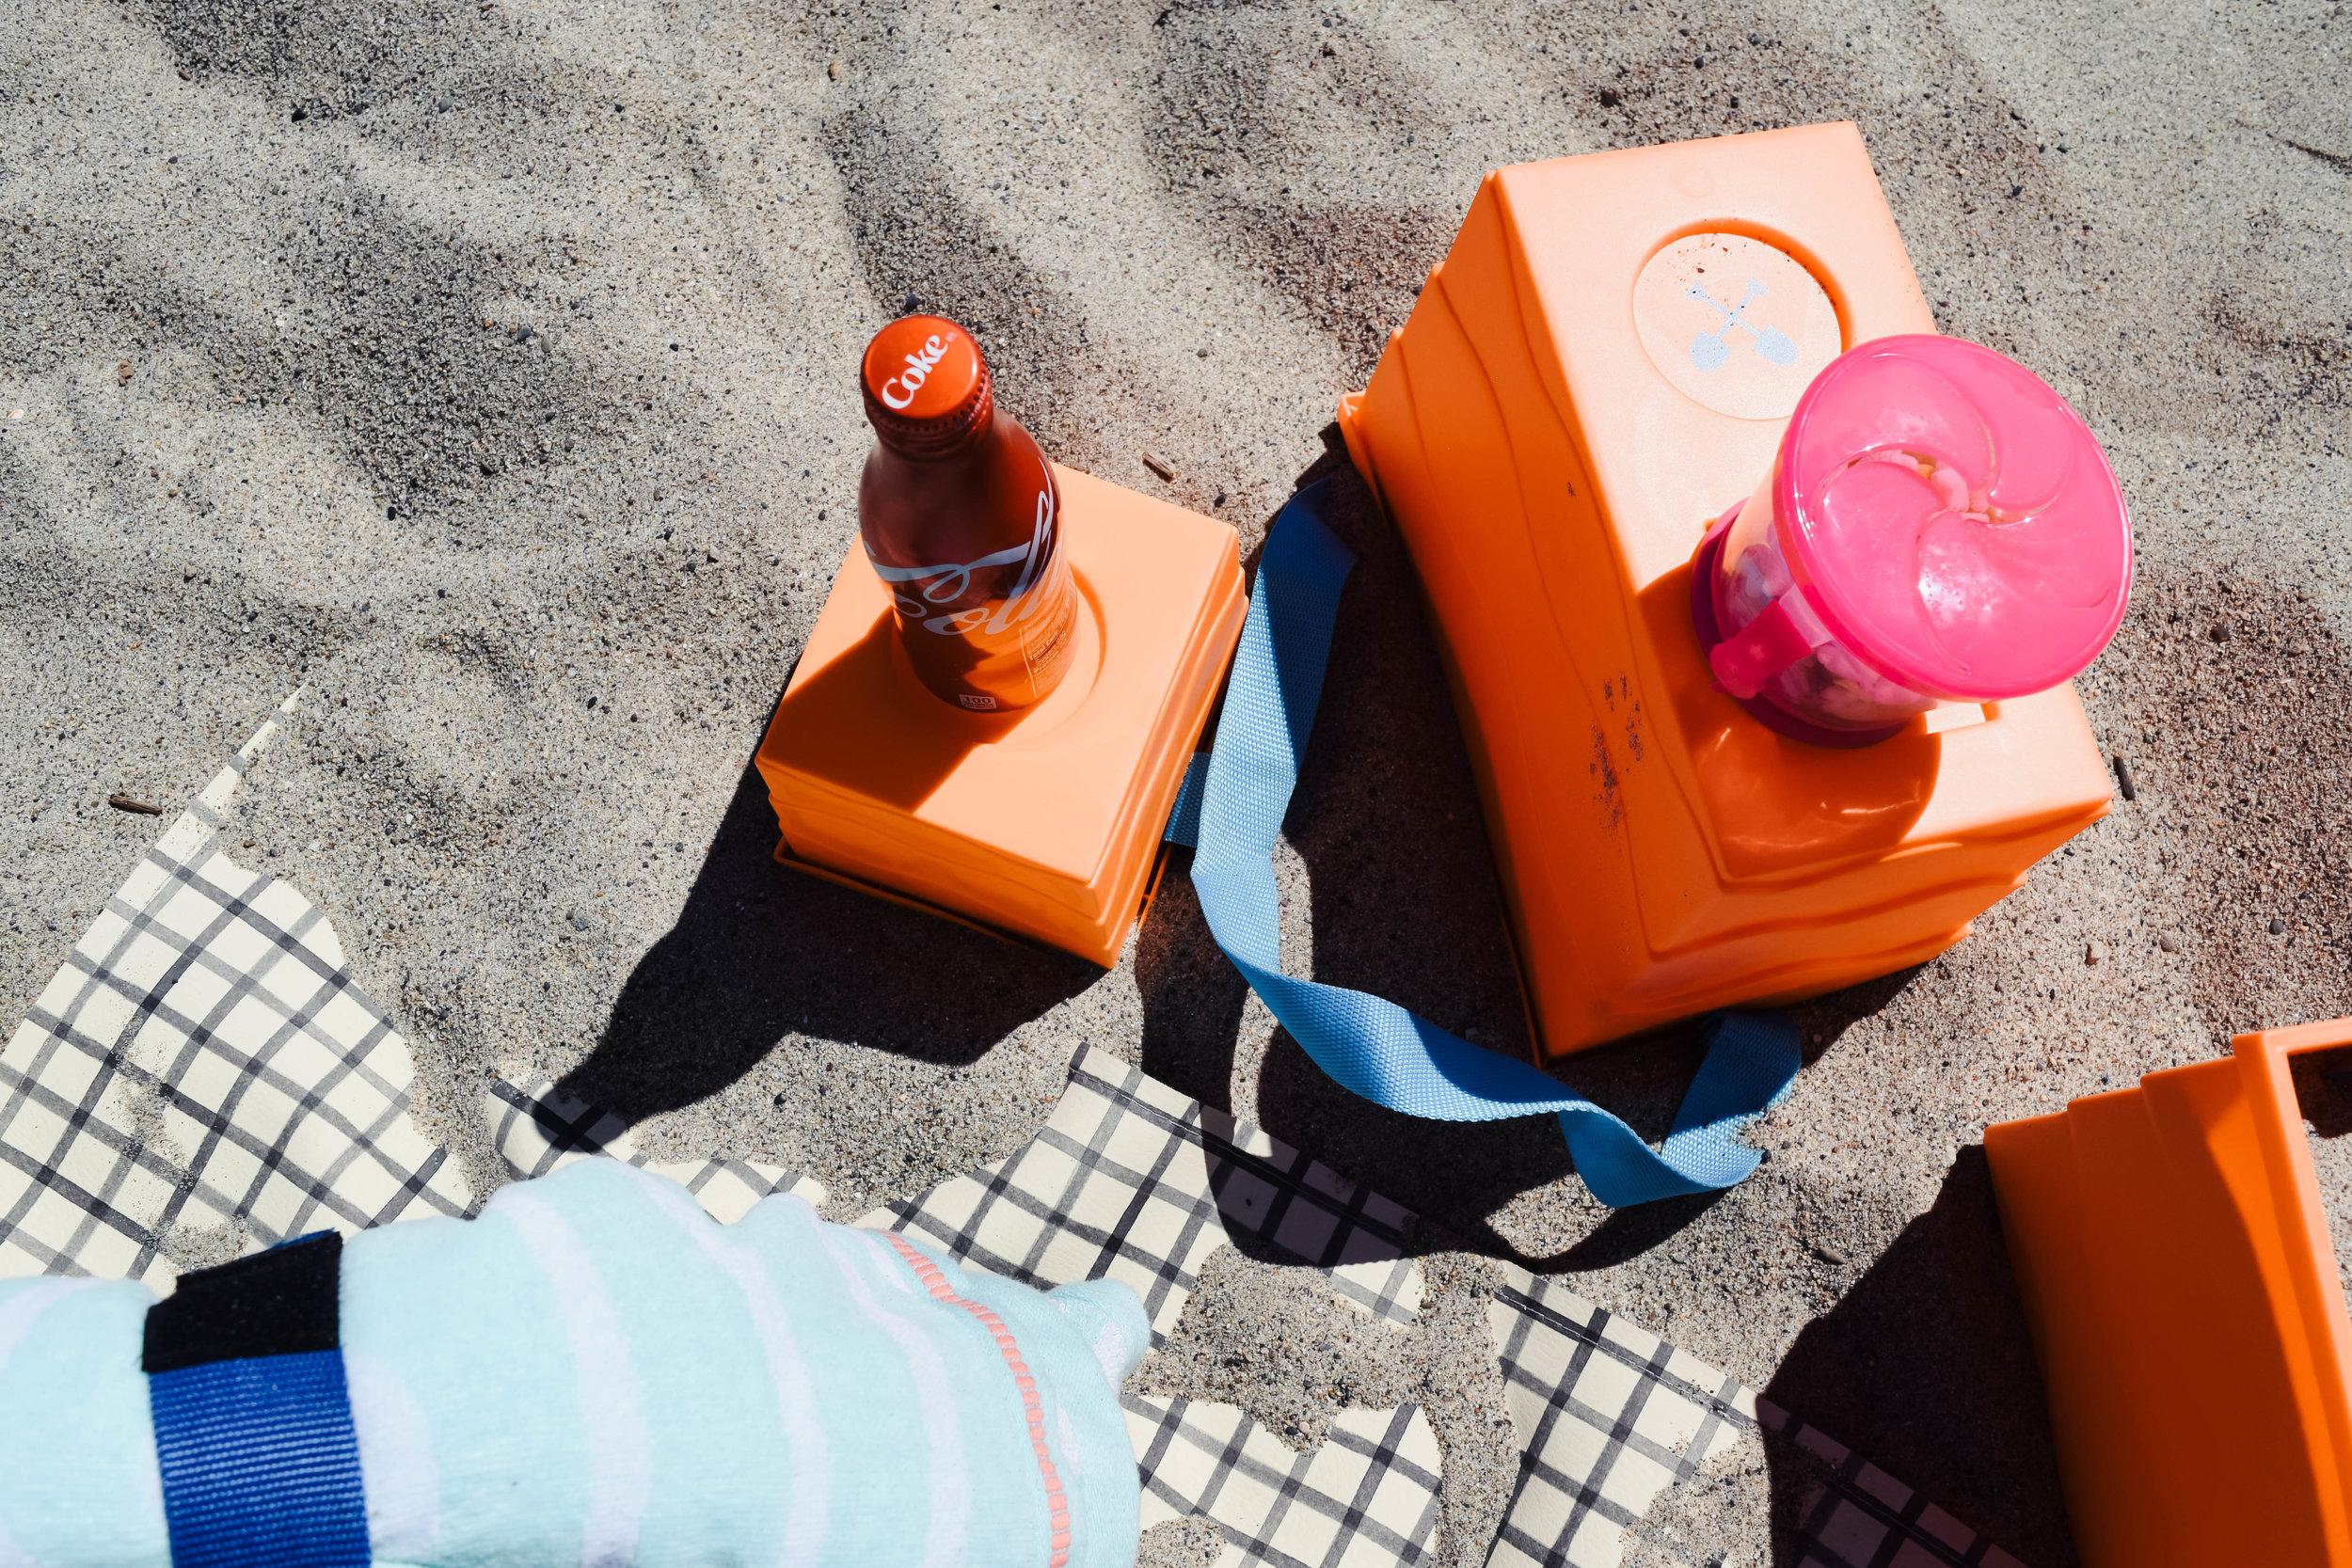 BEACHMATE | The All-In-One Family Beach Bag